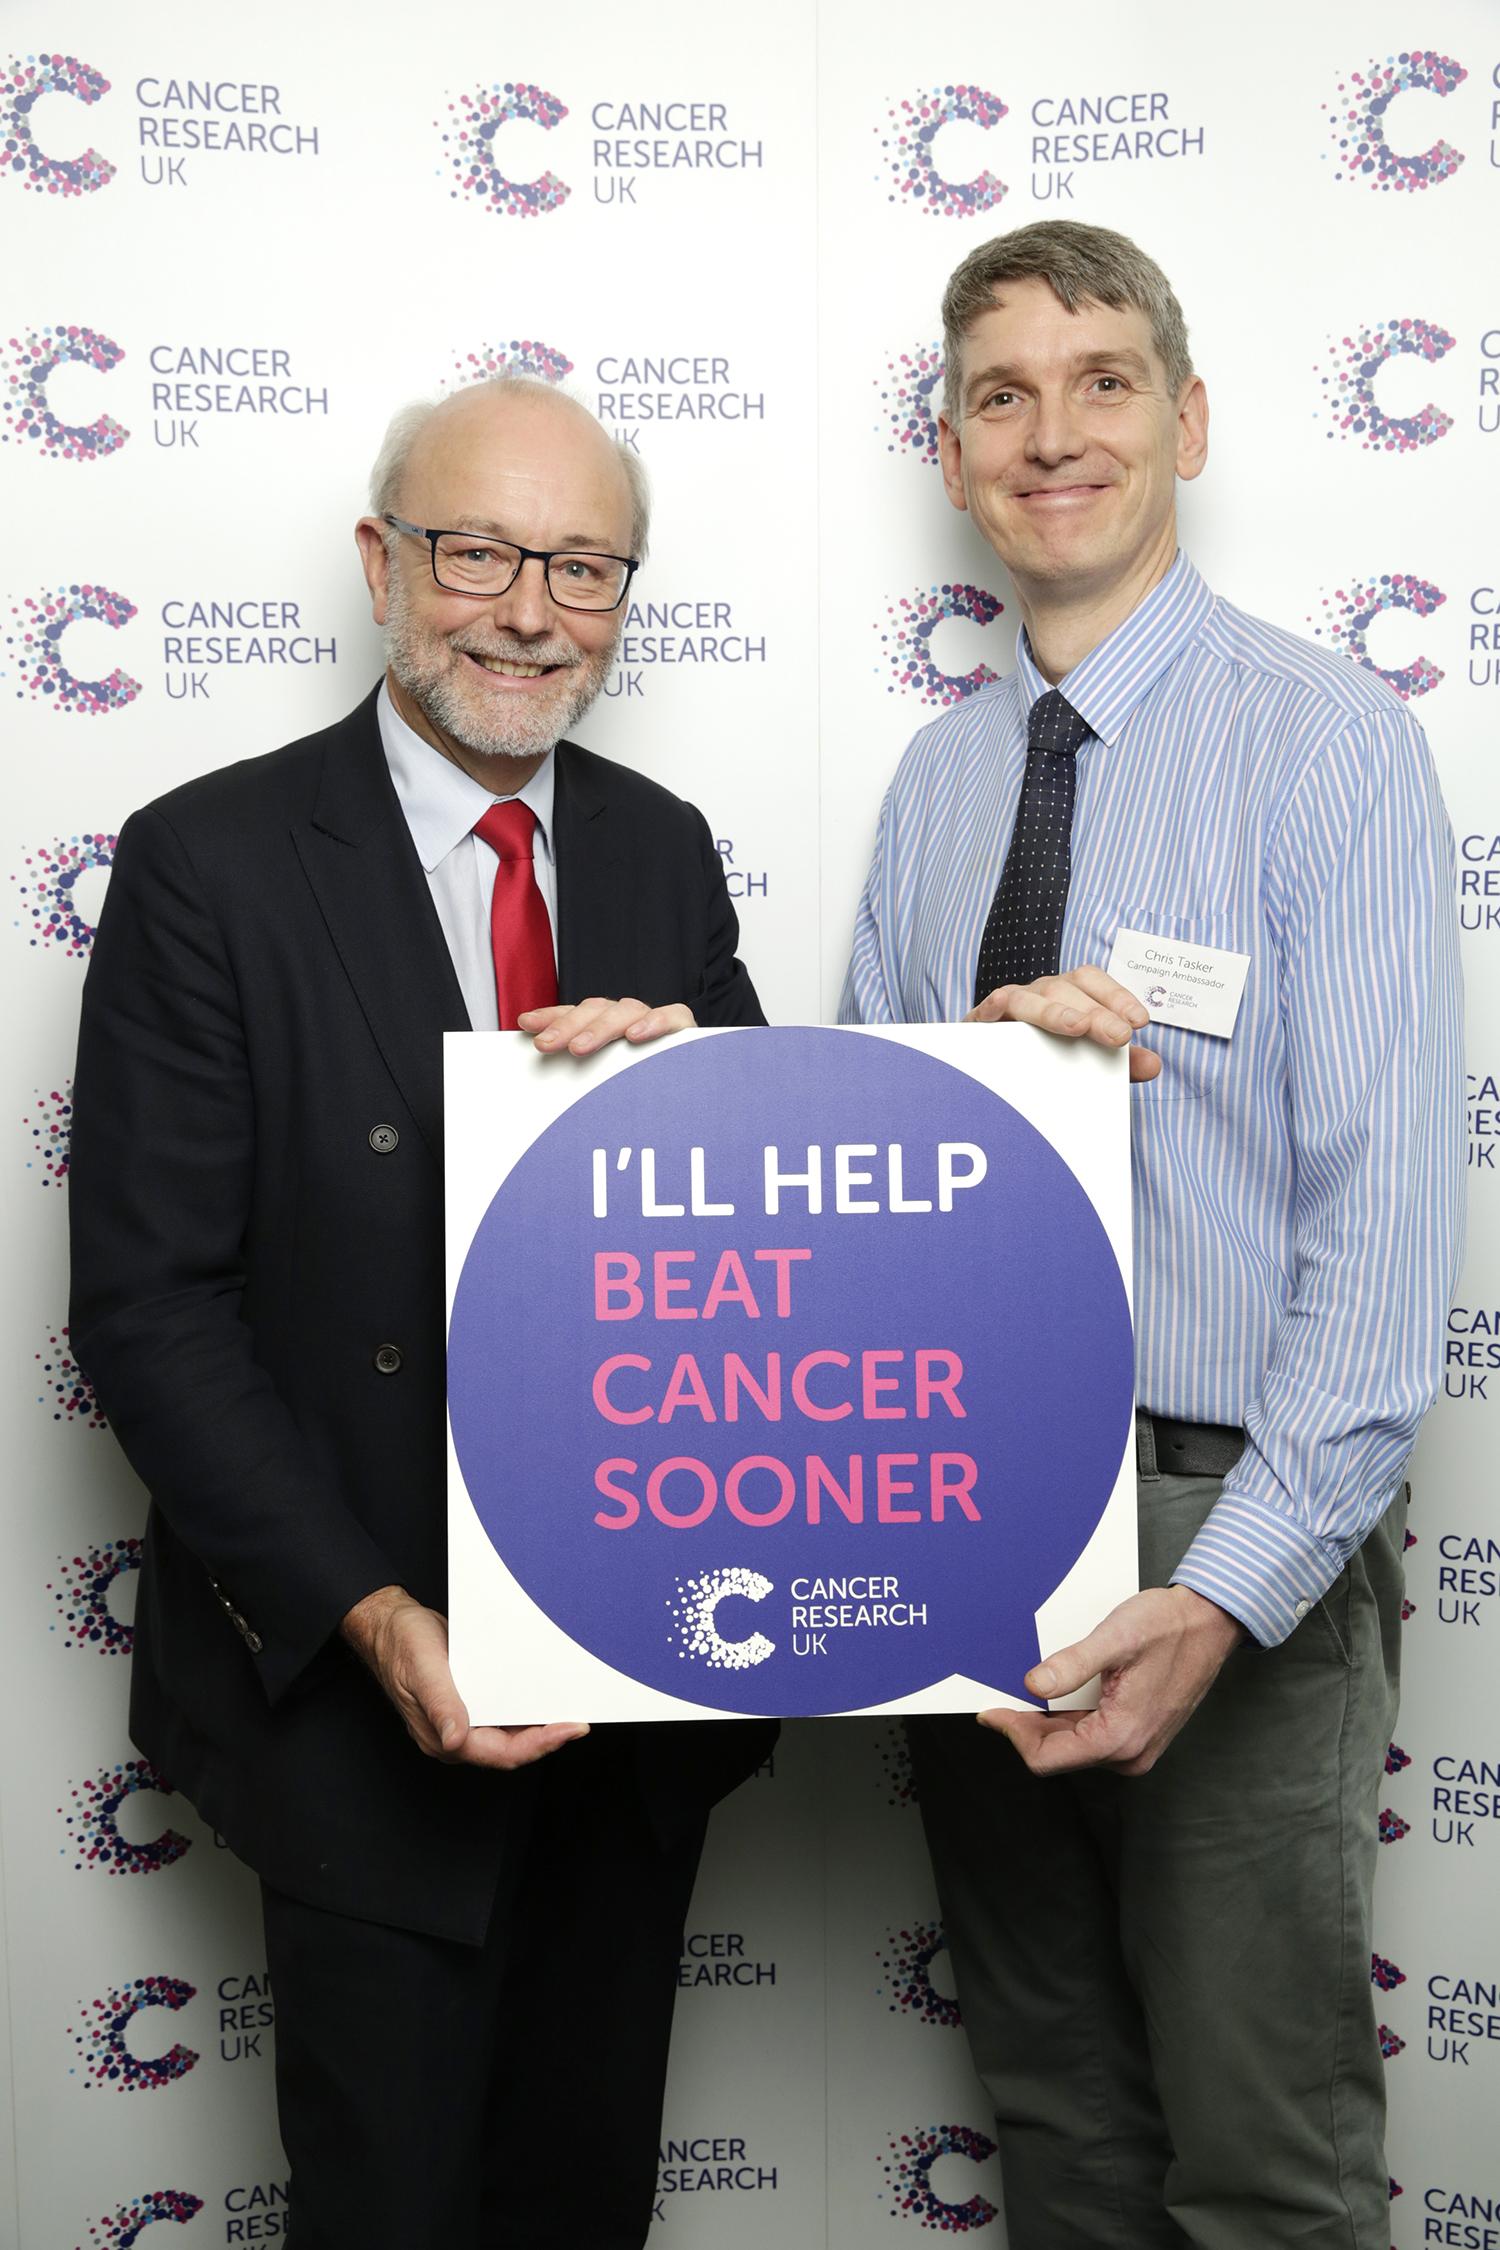 Alex pledges to help beat cancer sooner